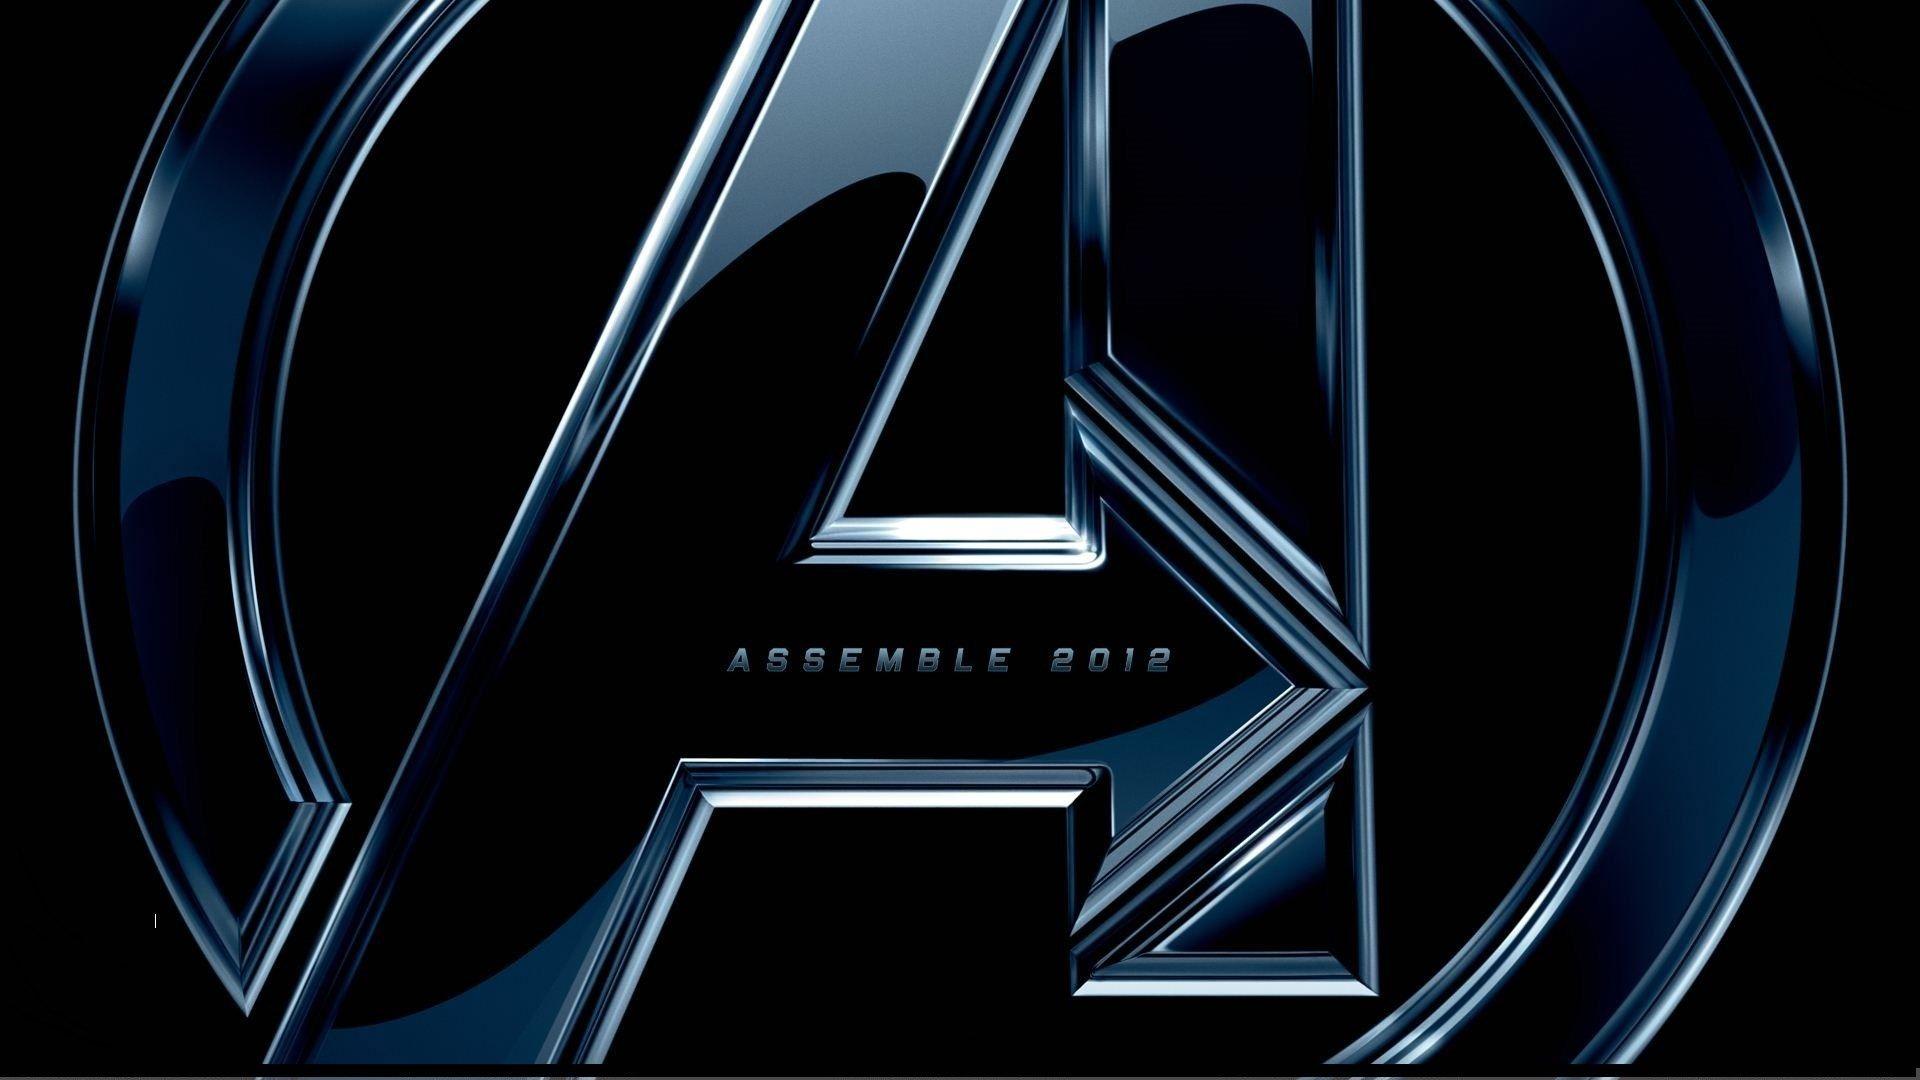 The Avengers Logo On Black Background Wallpapers Hd Avengers Logo Avengers Wallpaper Avengers 2012